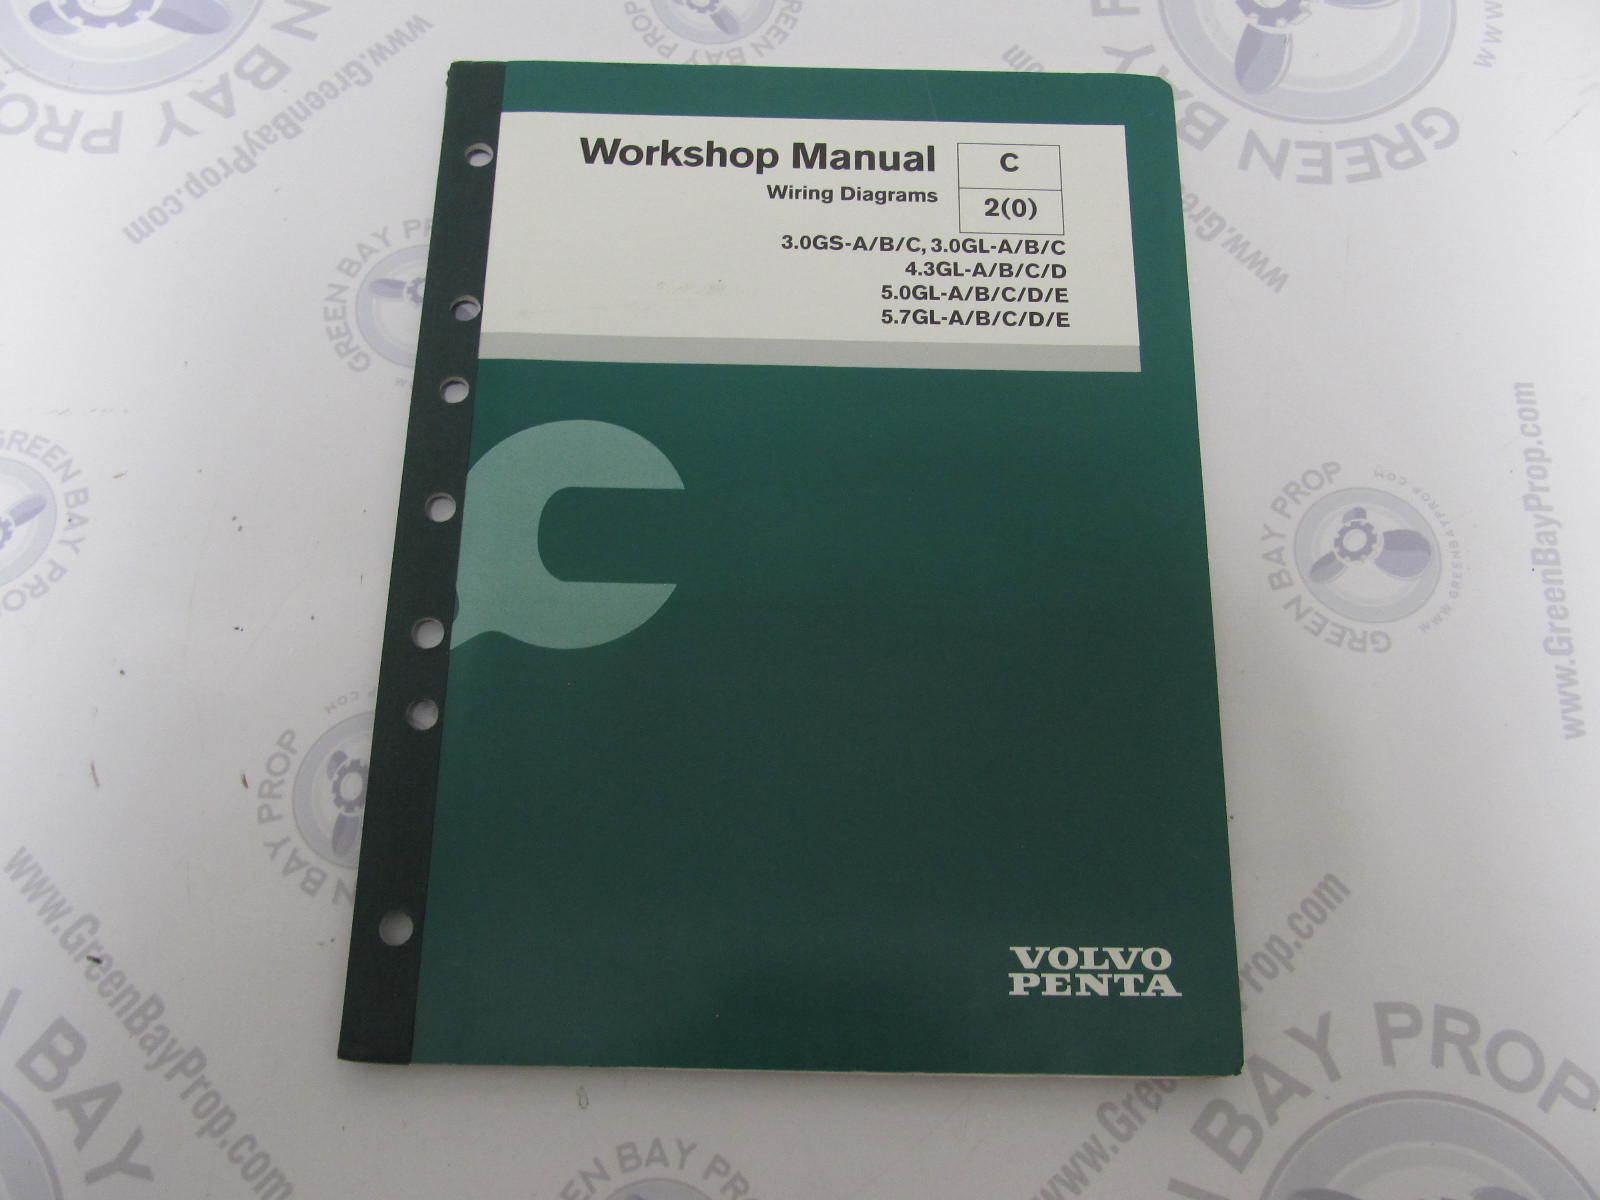 7743606 Volvo Penta Service Workshop Manual Wiring